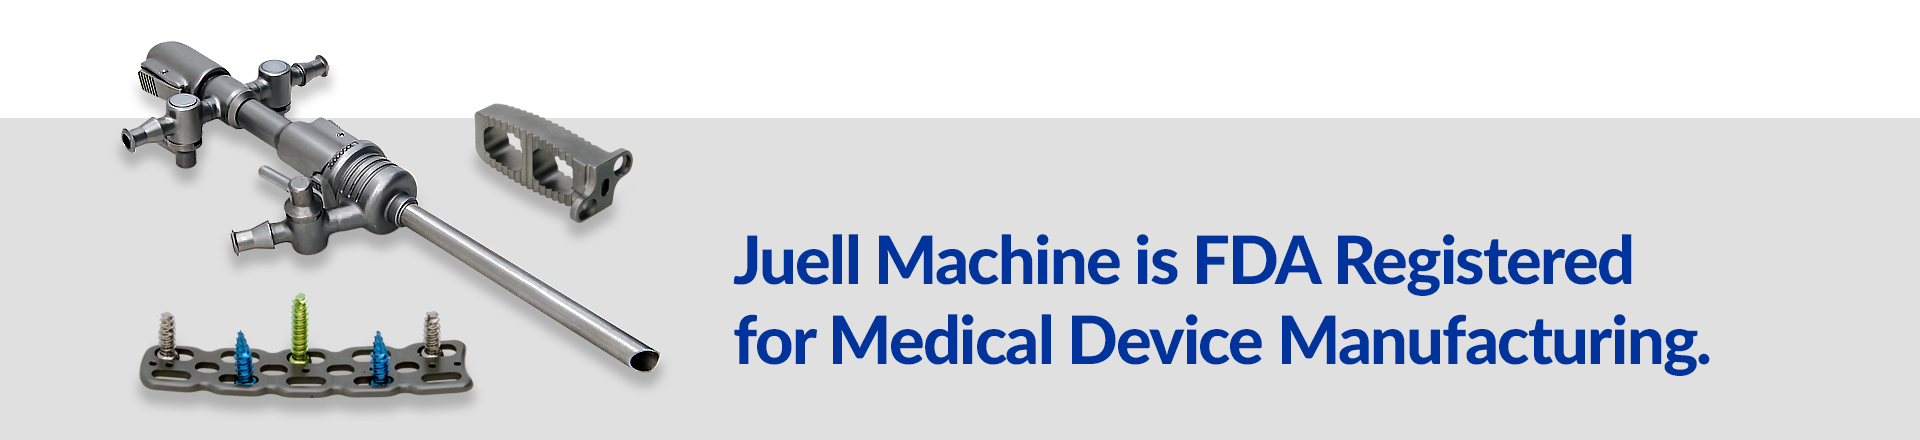 juell-image-band-SLIDER-medical-1920×440-2019-04-09